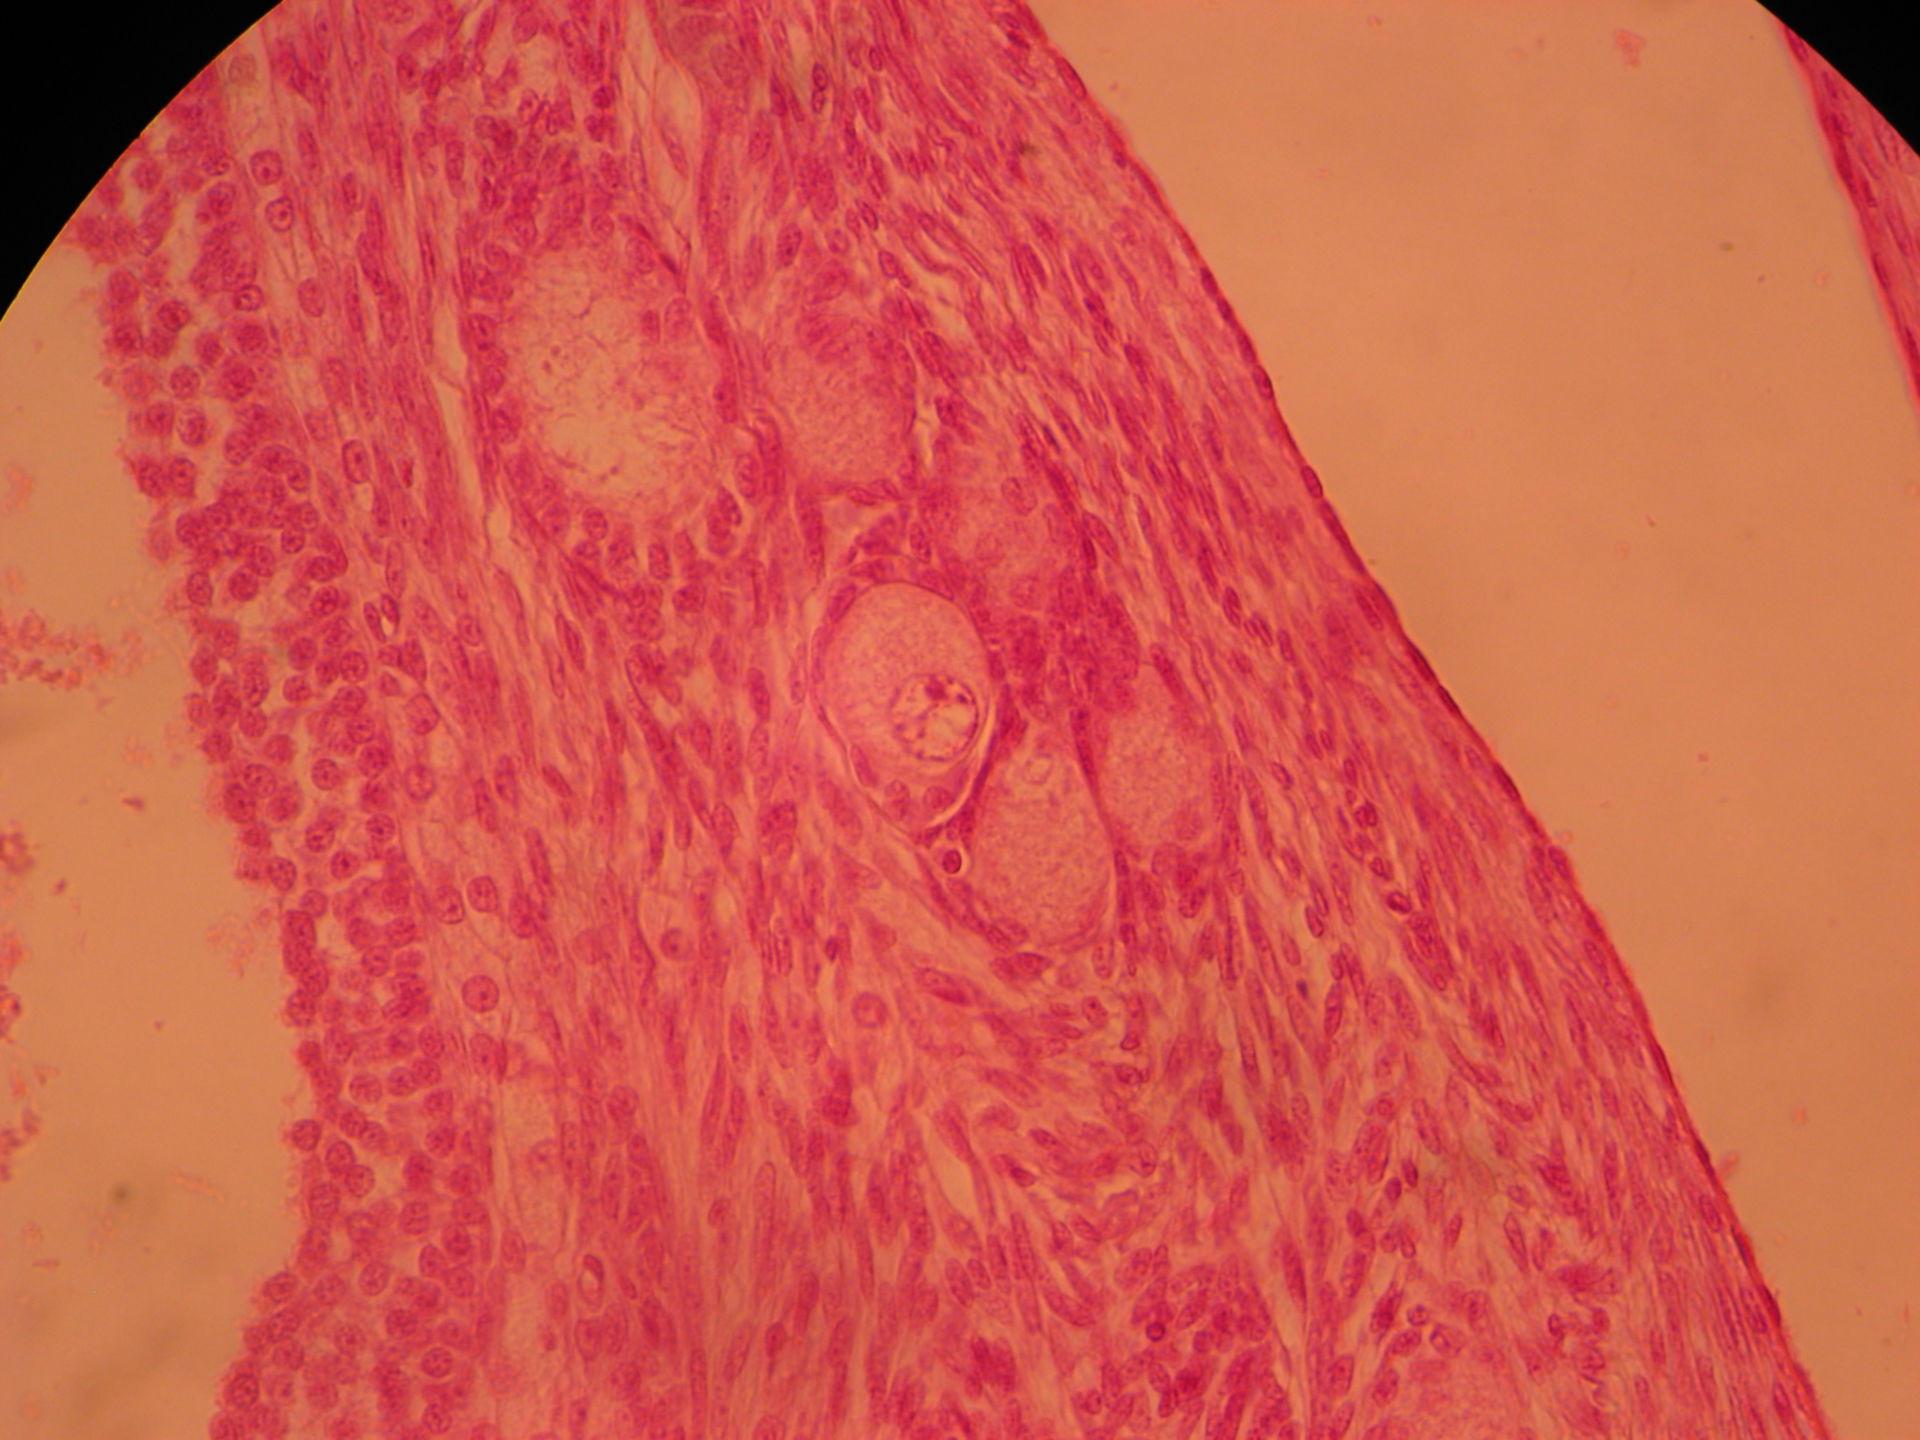 Veterinary Medicine: Ovary of a Cat (9)- Primordial Follicle